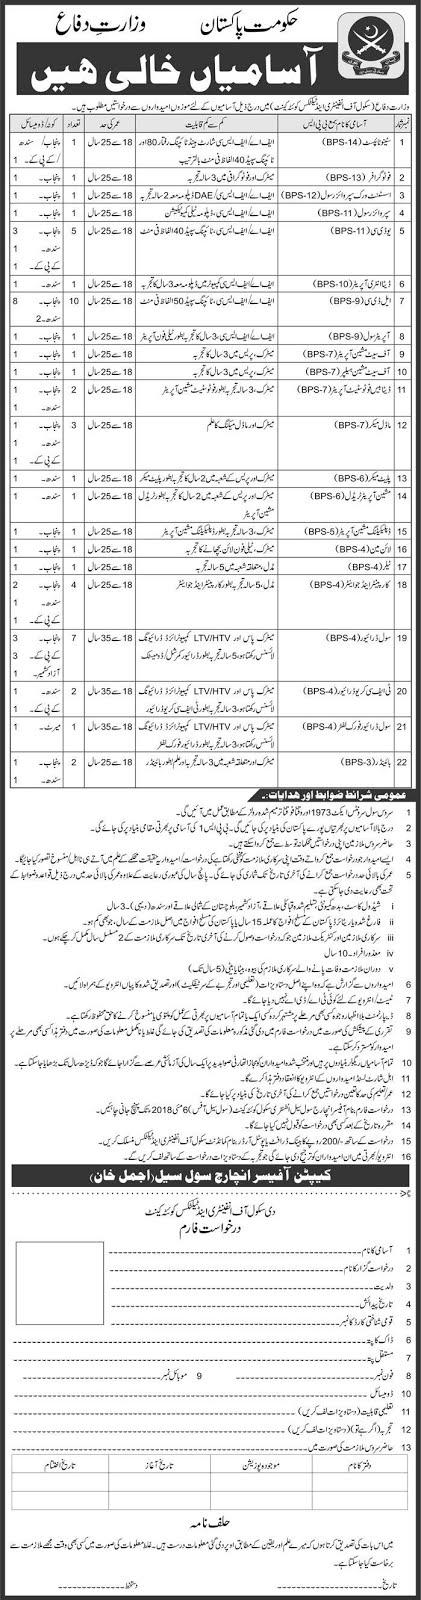 Jobs in Quetta, Jobs in Balochistan, Jobs in Pakistan